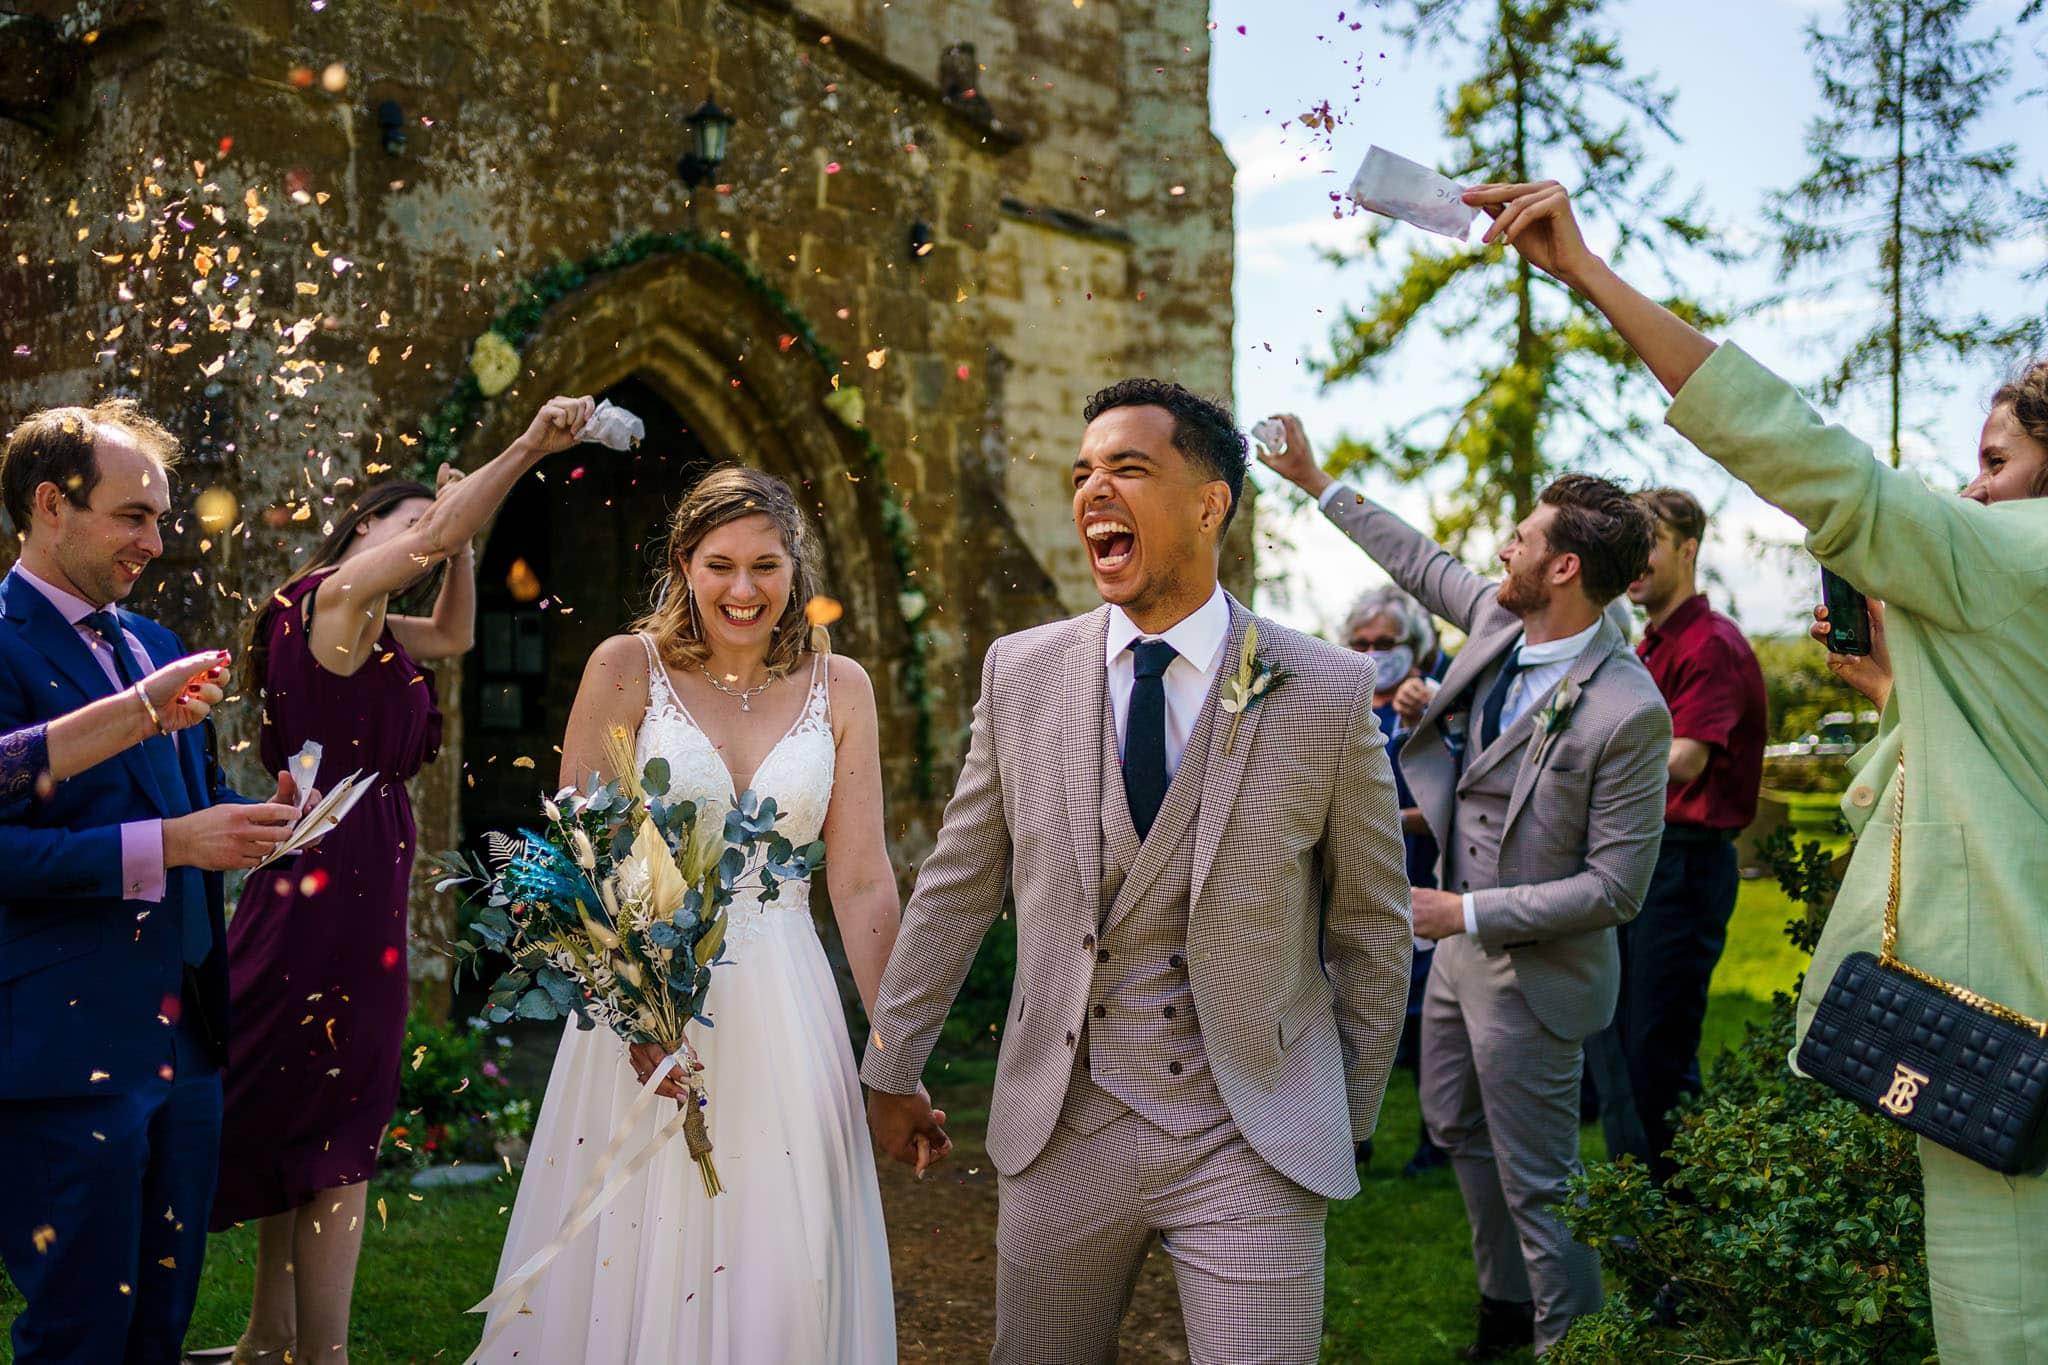 Oxhill wedding photography happy confetti shot